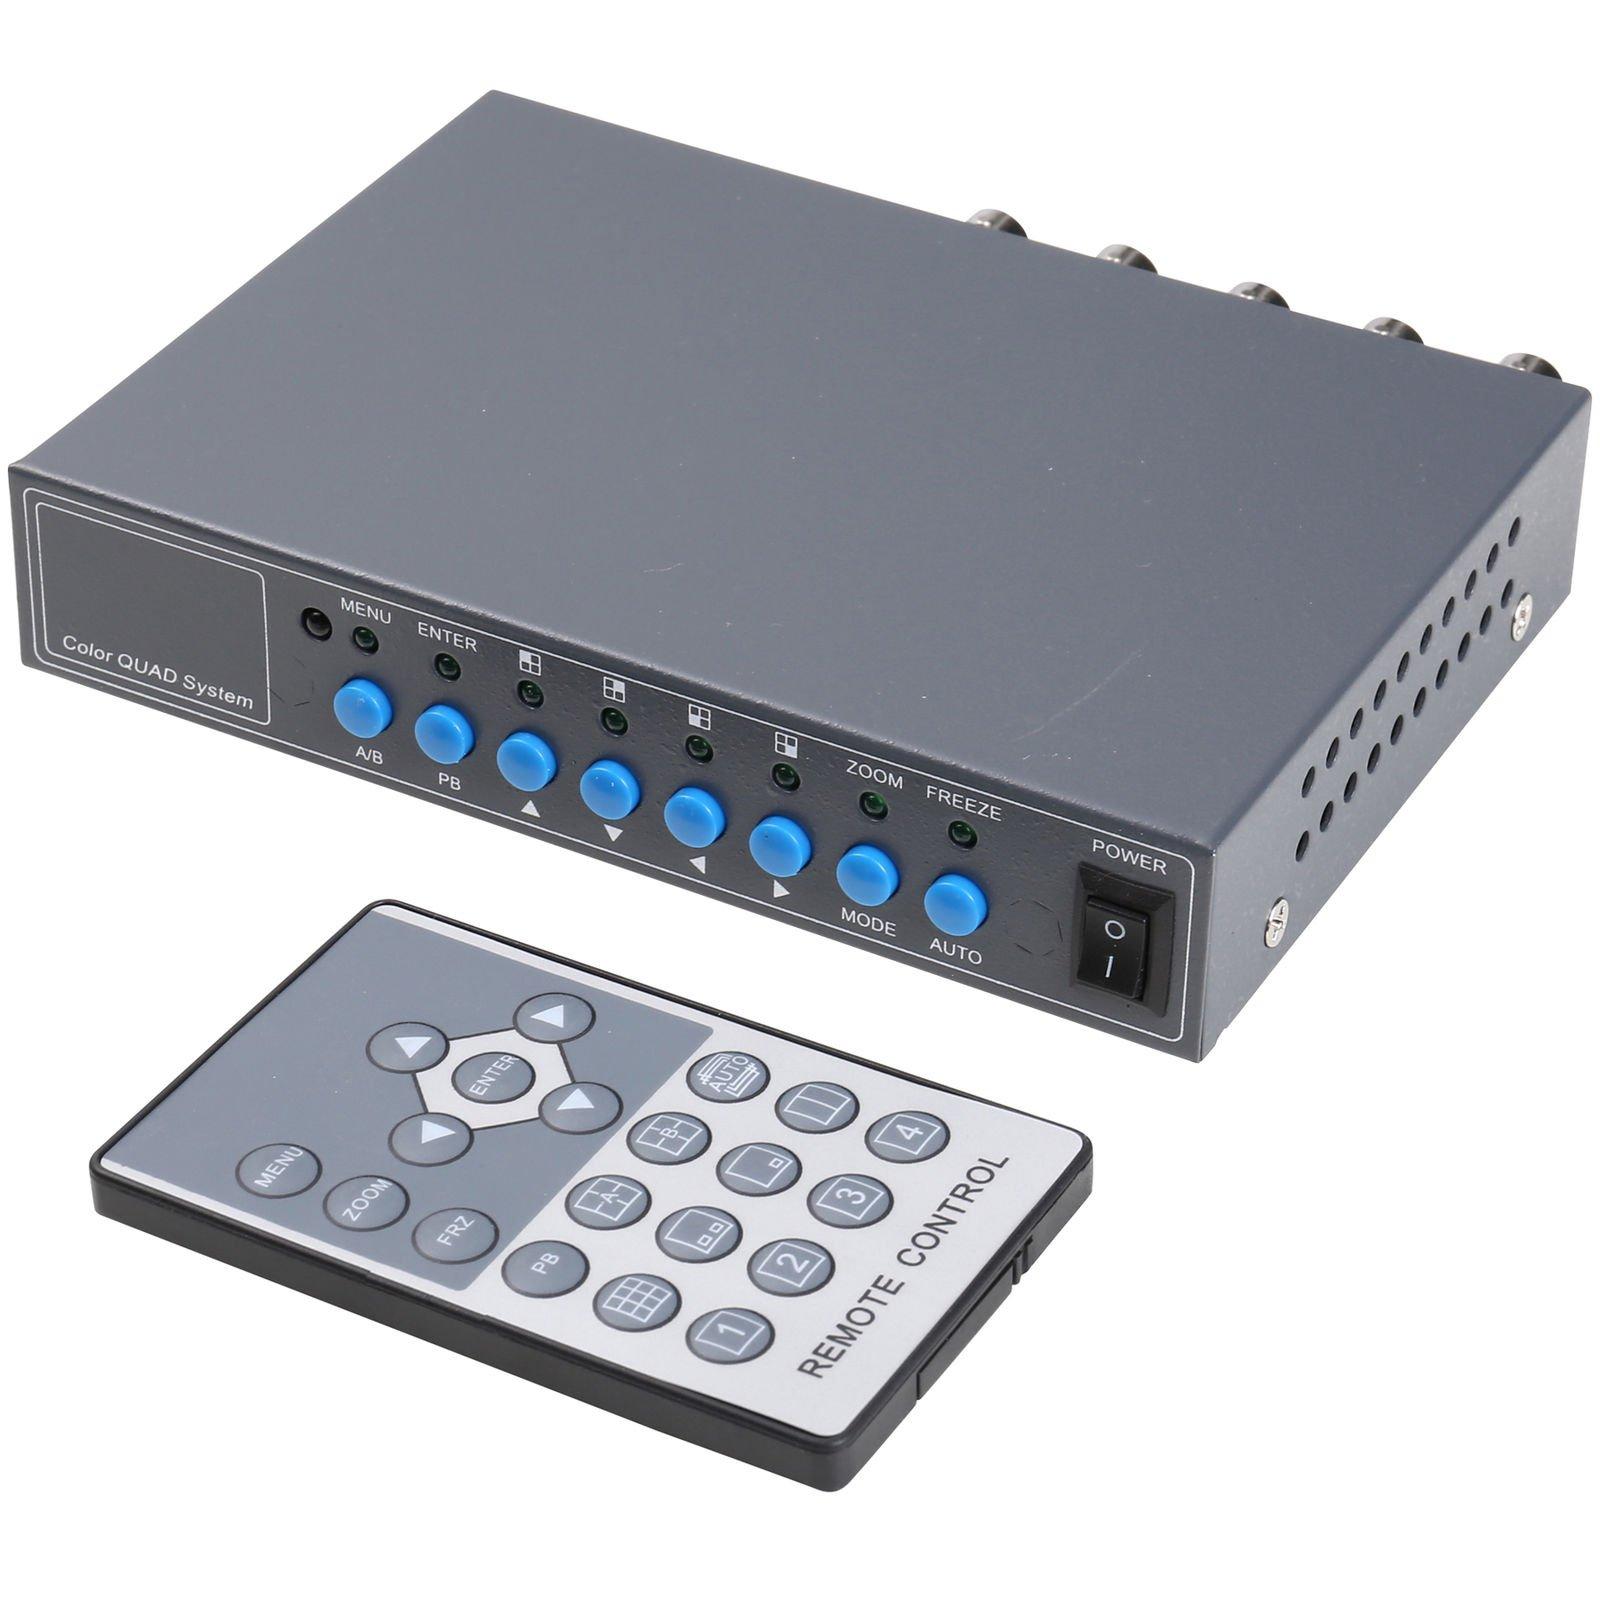 UHPPOTE 4CH Color QUAD System Video Splitter CCTV Camera Processor with Remote Control